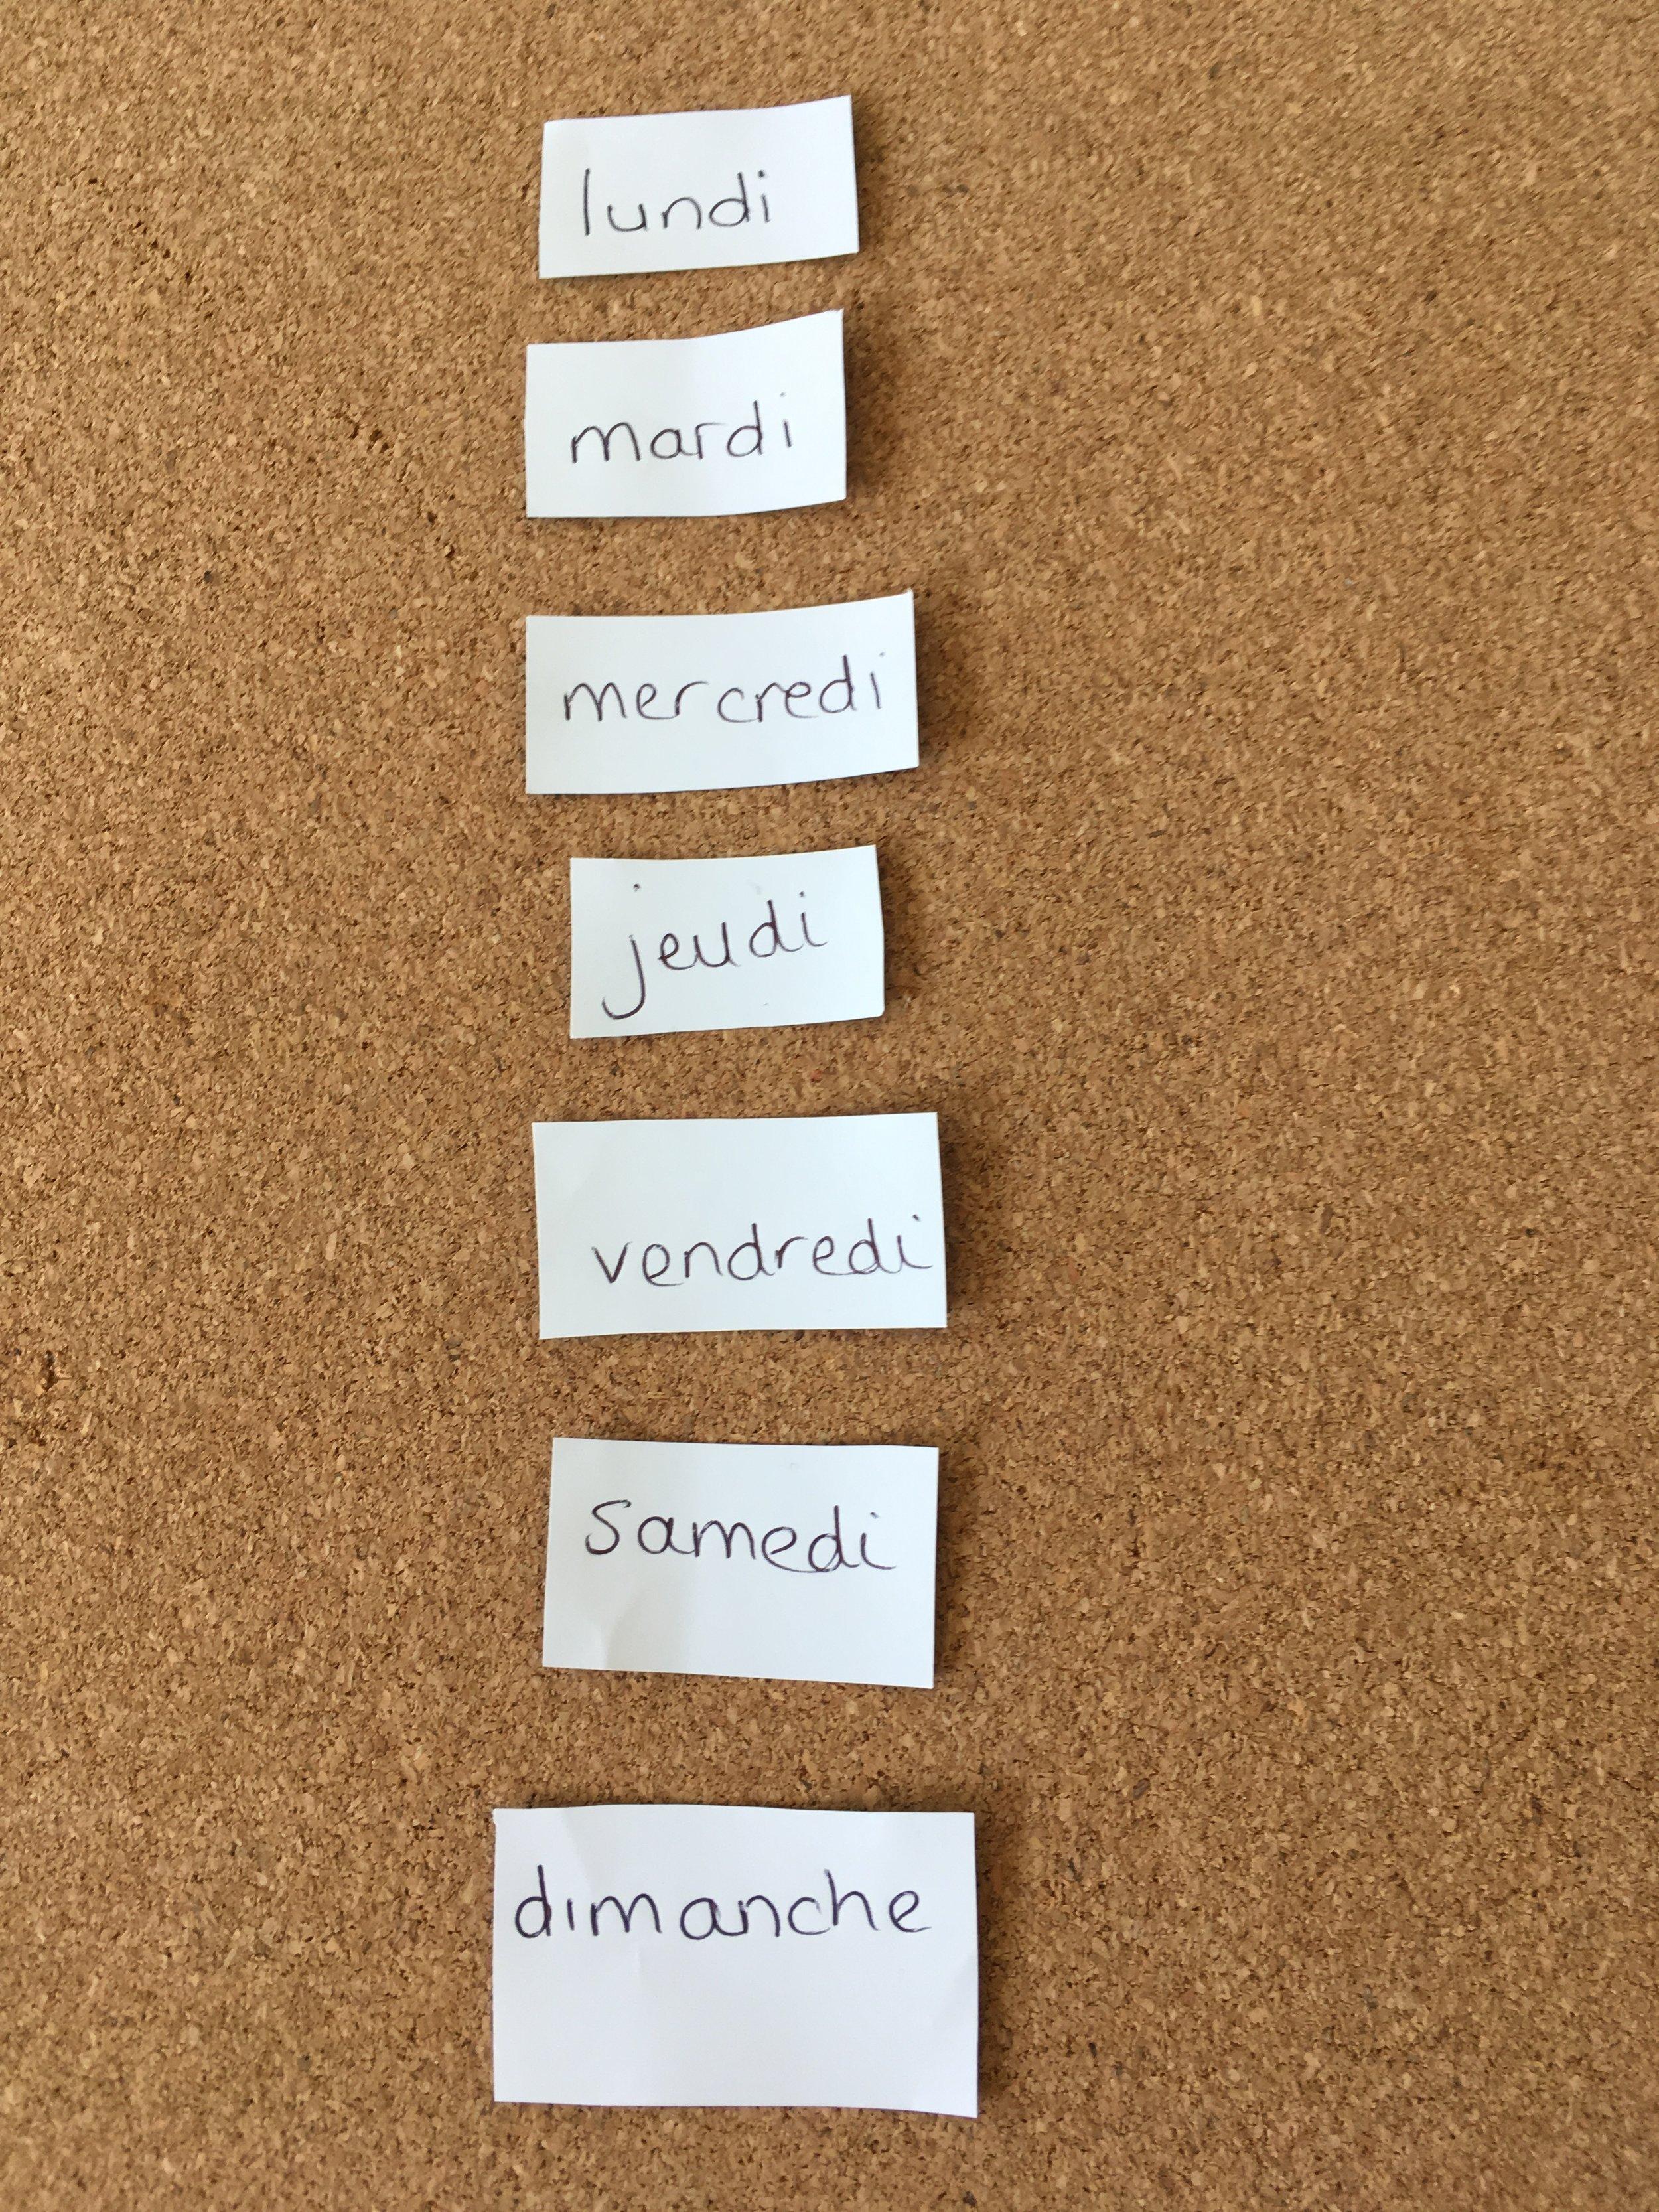 Day word cards.JPG